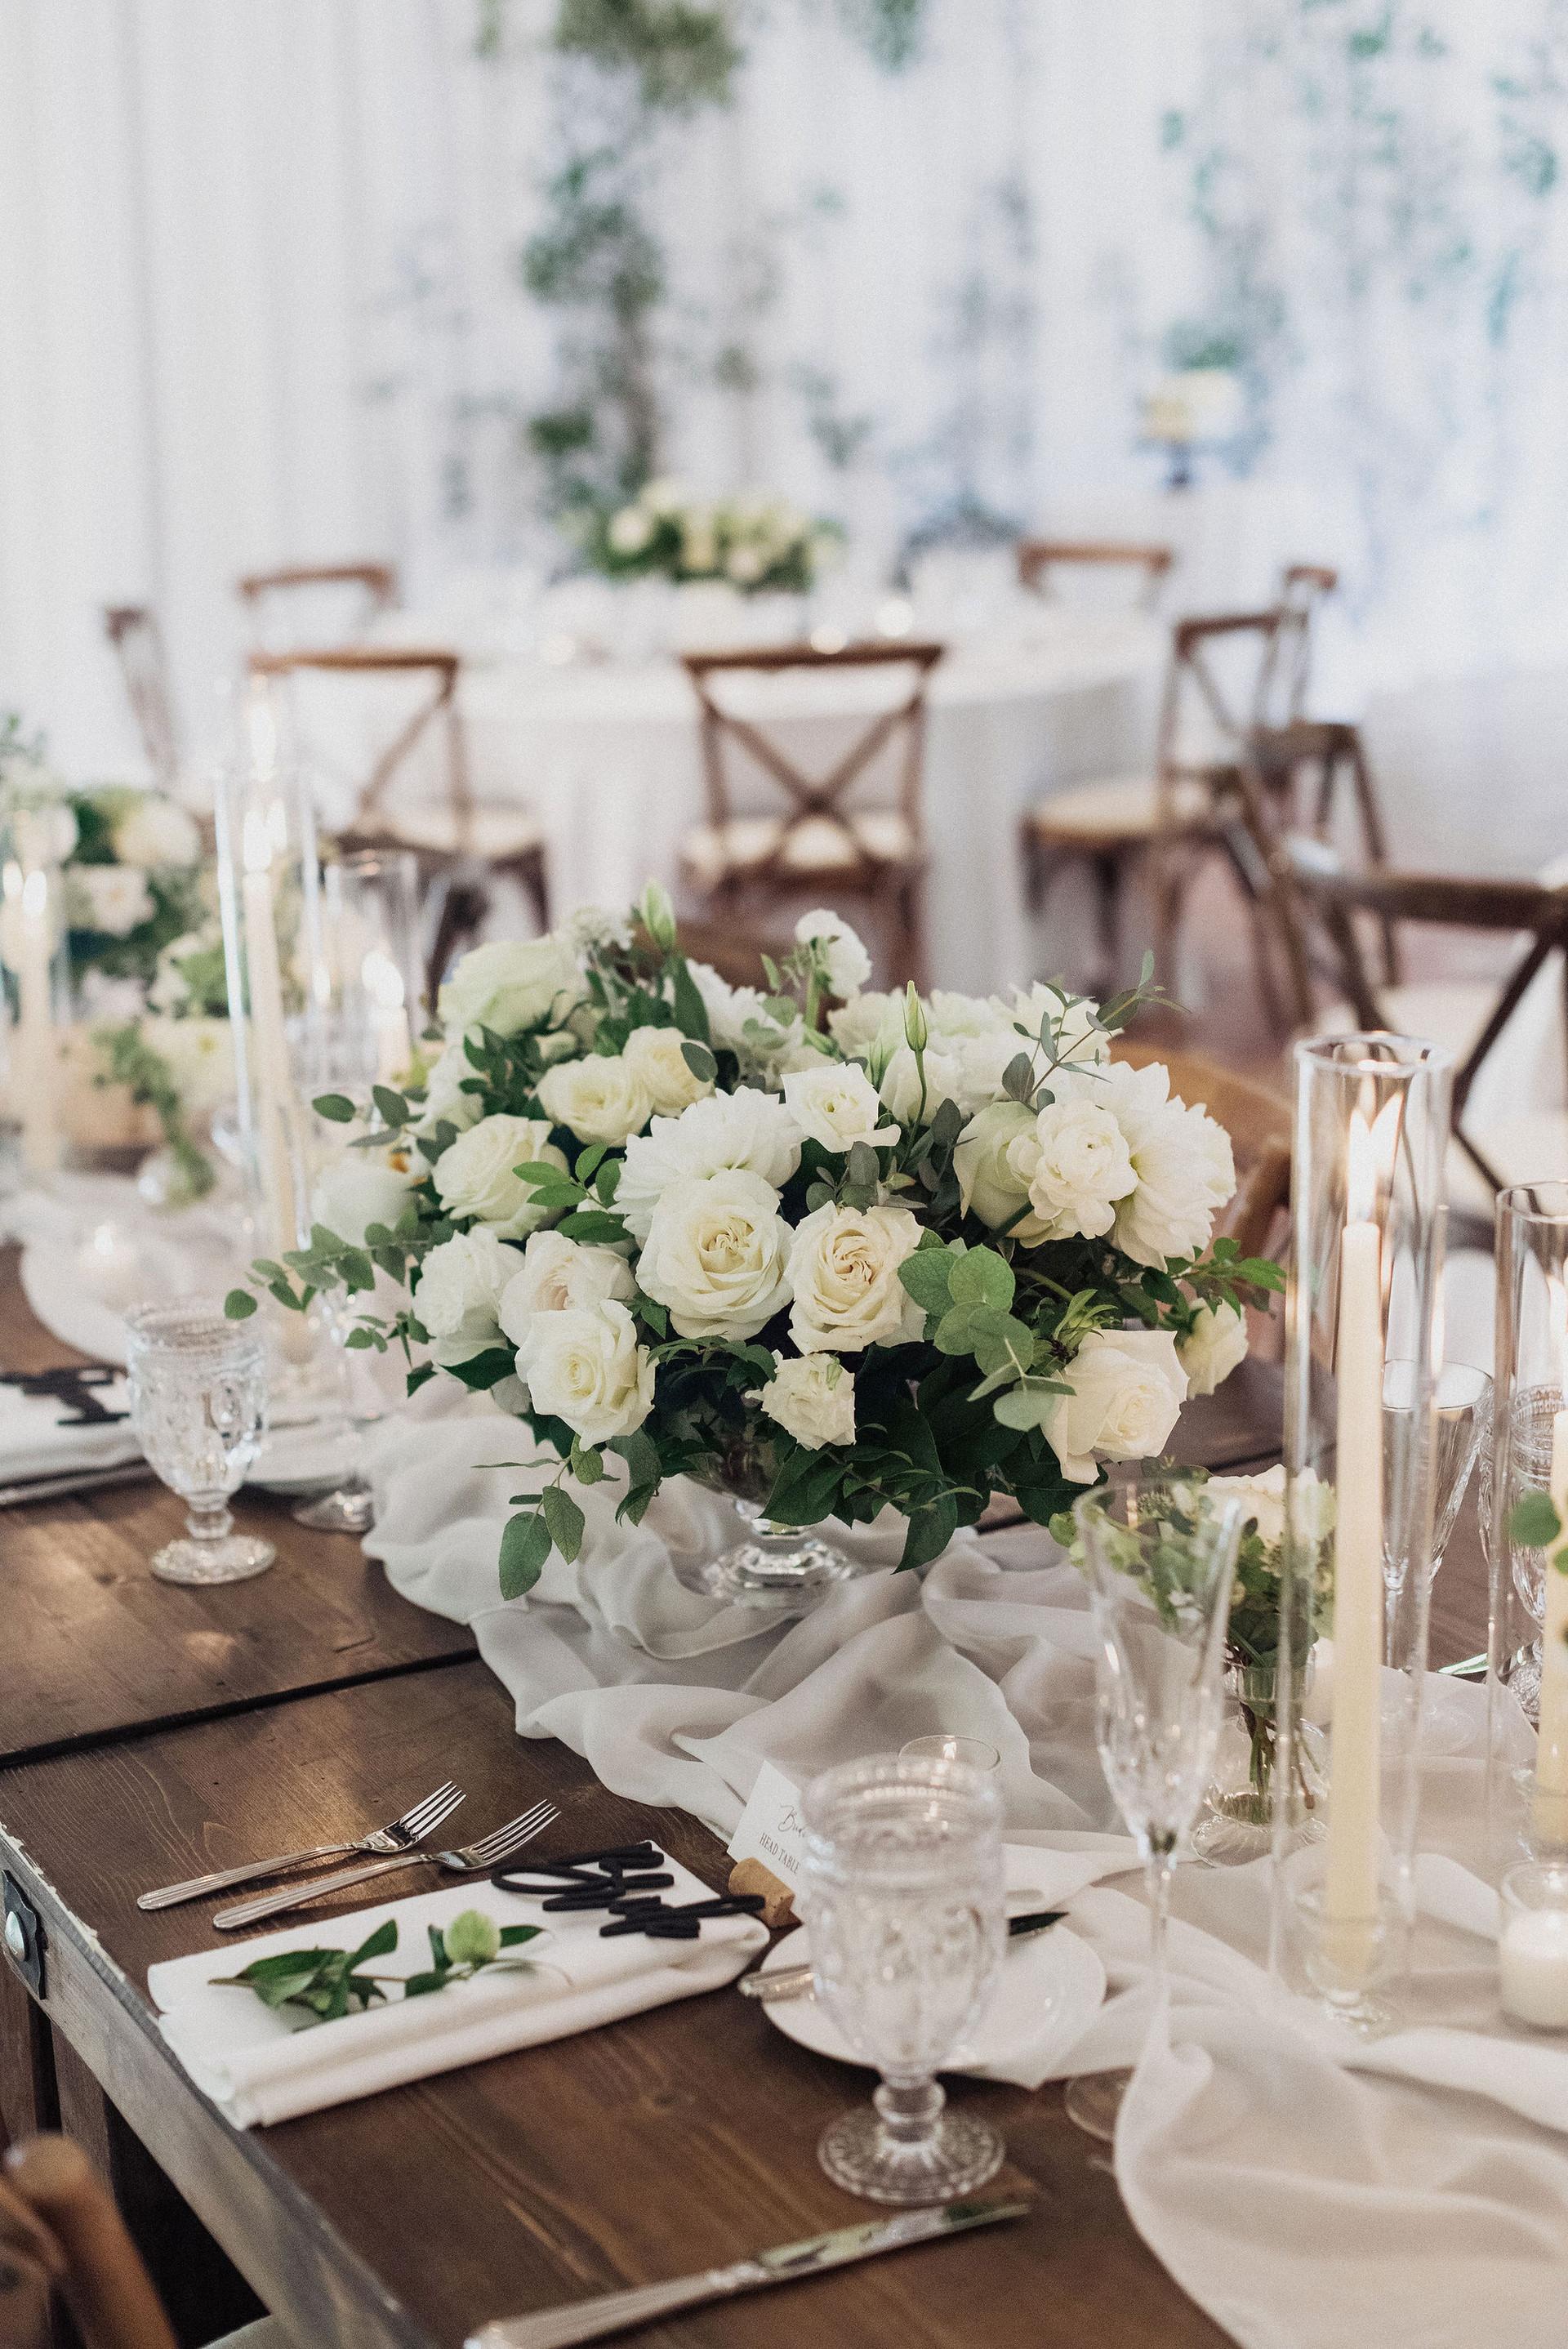 White and cream centerpieces with roses, dahlias, ranunculus, eucalyptus and vines. Photo: Eden Strader